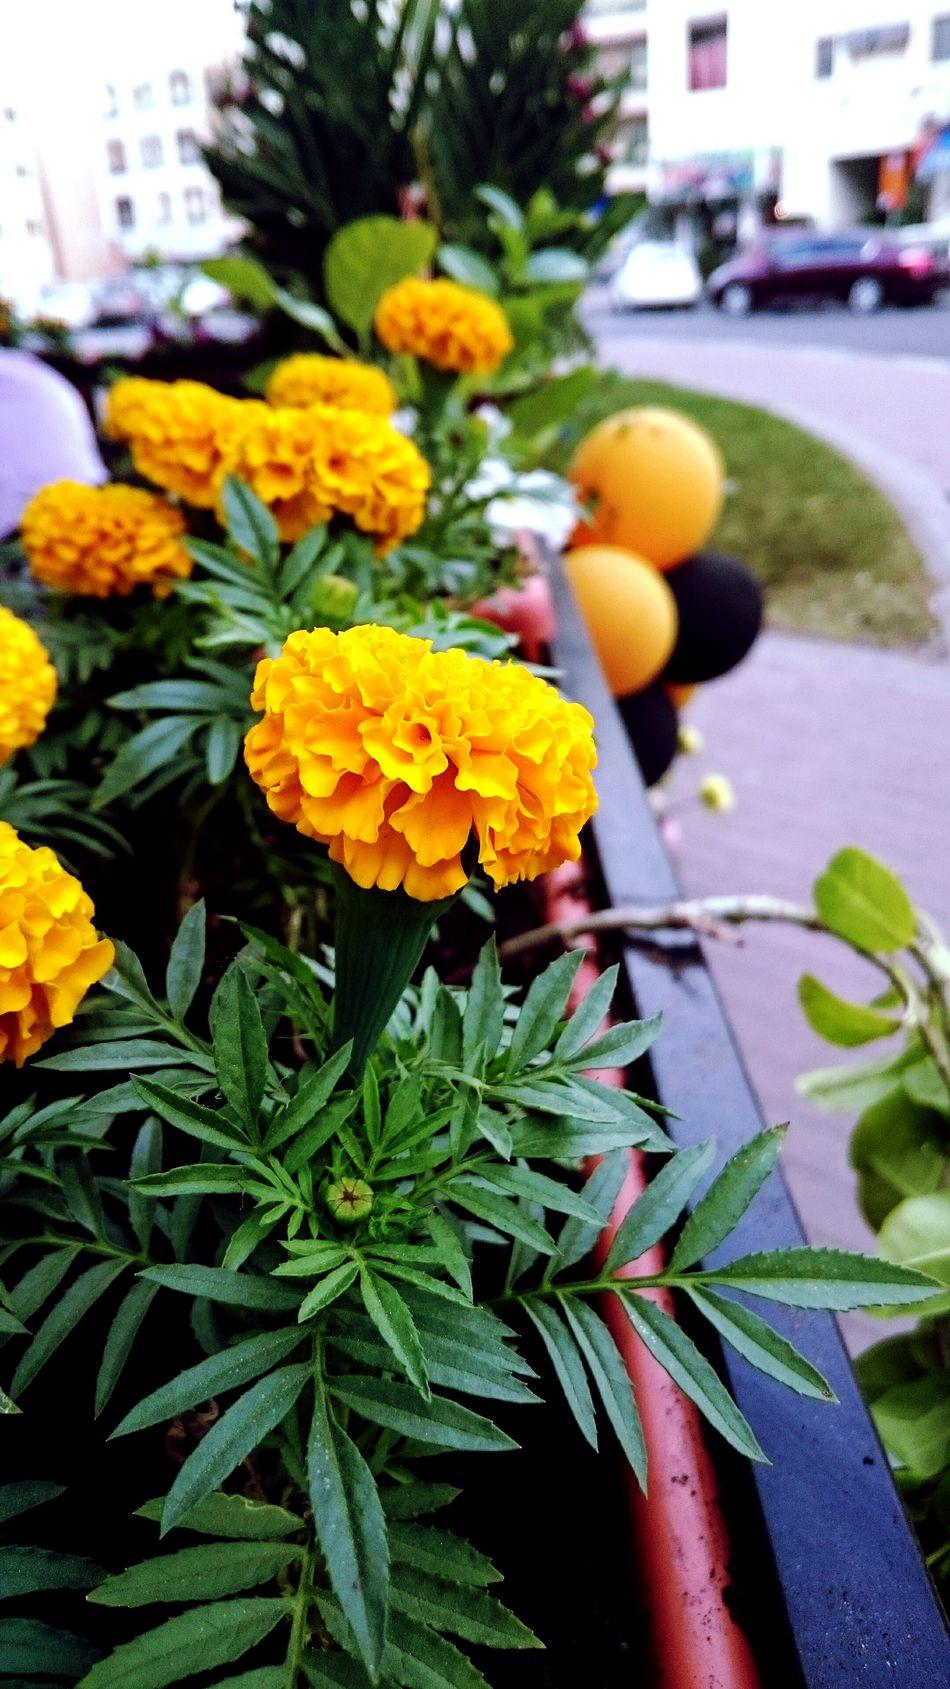 Karama Flower Flora Dubai Marigold Photography Dubai❤ DXB Dubai UAE Likeforlike Tagsforlikes Tagstagramers Smartphonephotography Mobilephotography XPERIA Sony XperiaZ3 Xperiaz3photography Livelovedubai